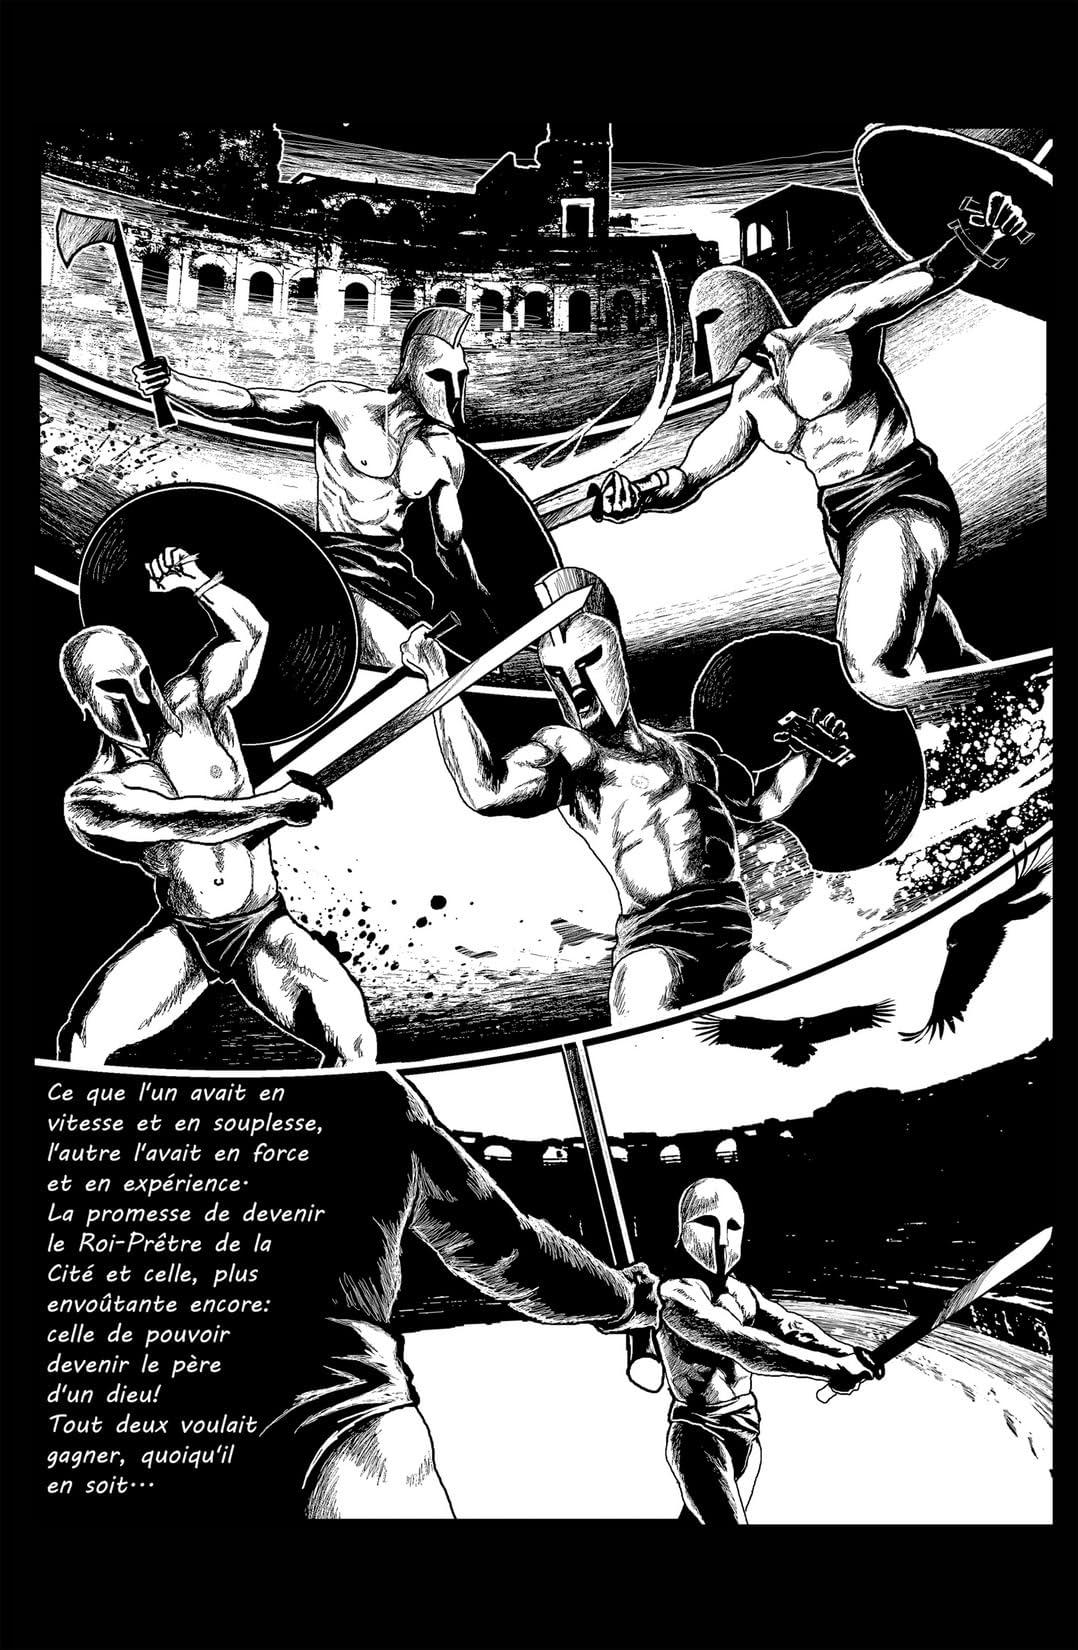 DEAD MEAT COMIX le mag Vol. 1